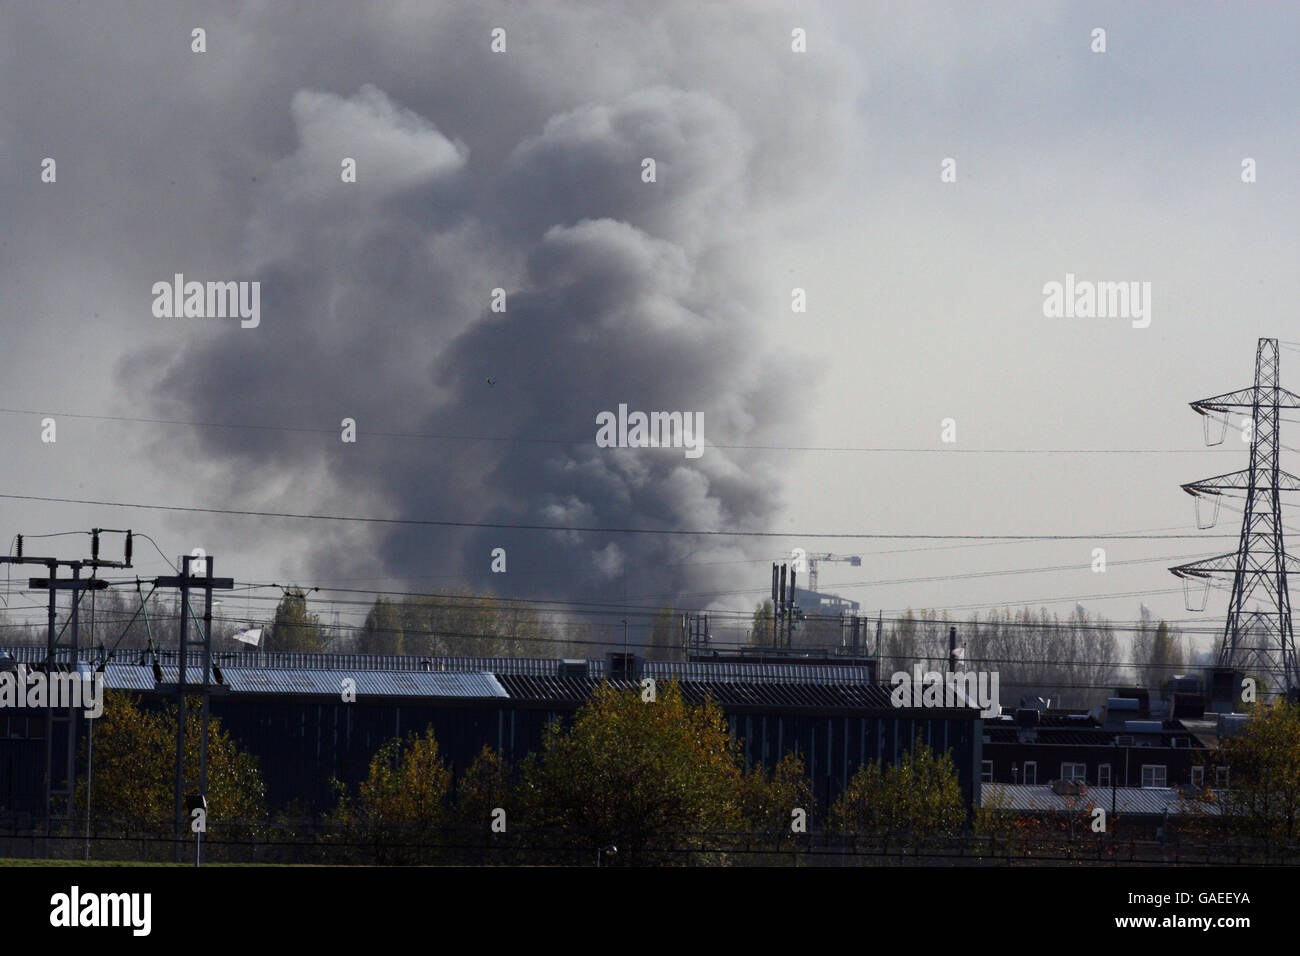 Fire in Stratford Stock Photo: 109727838 - Alamy